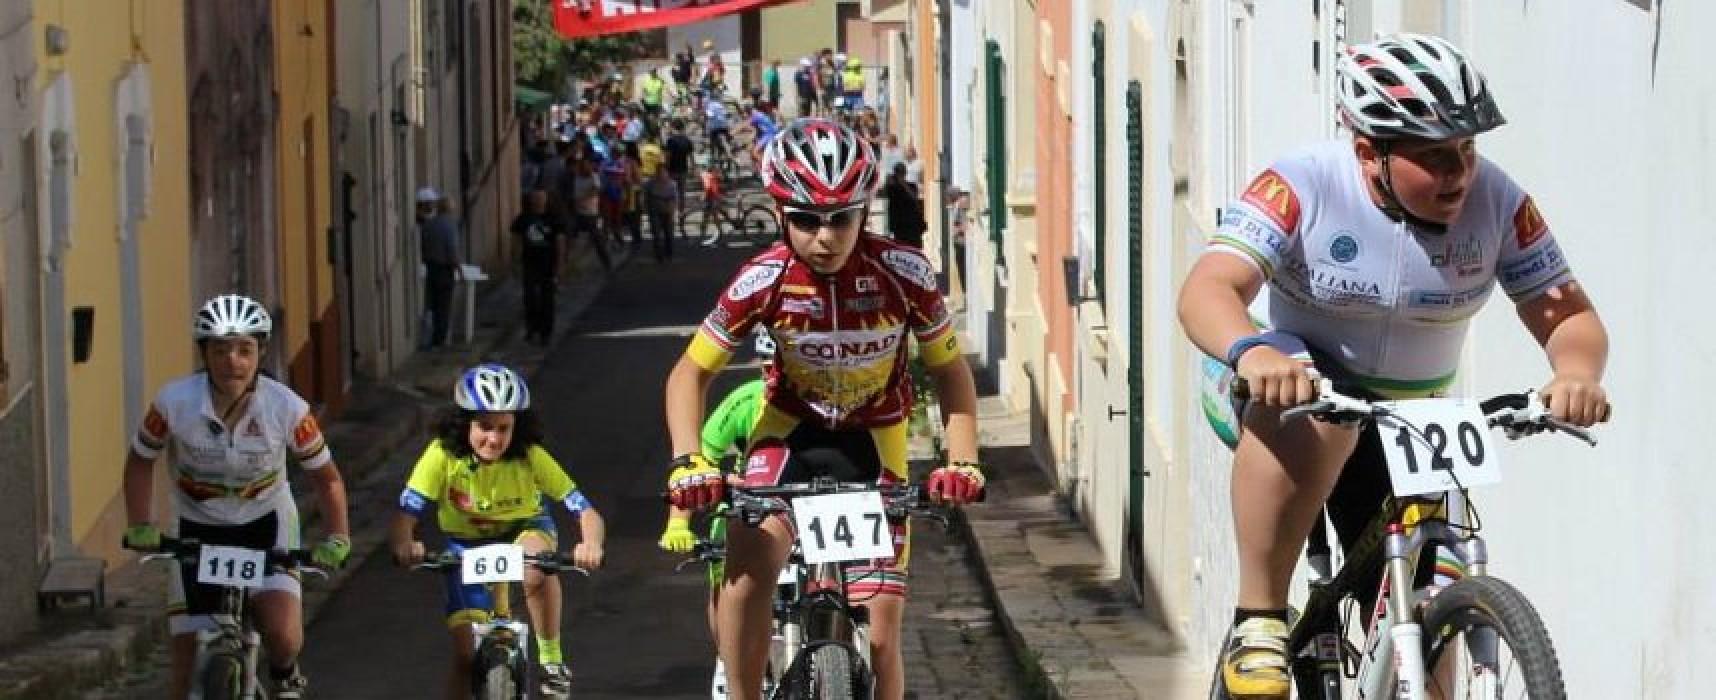 Ciclismo, Cavallaro protagonista ai campionati regionali